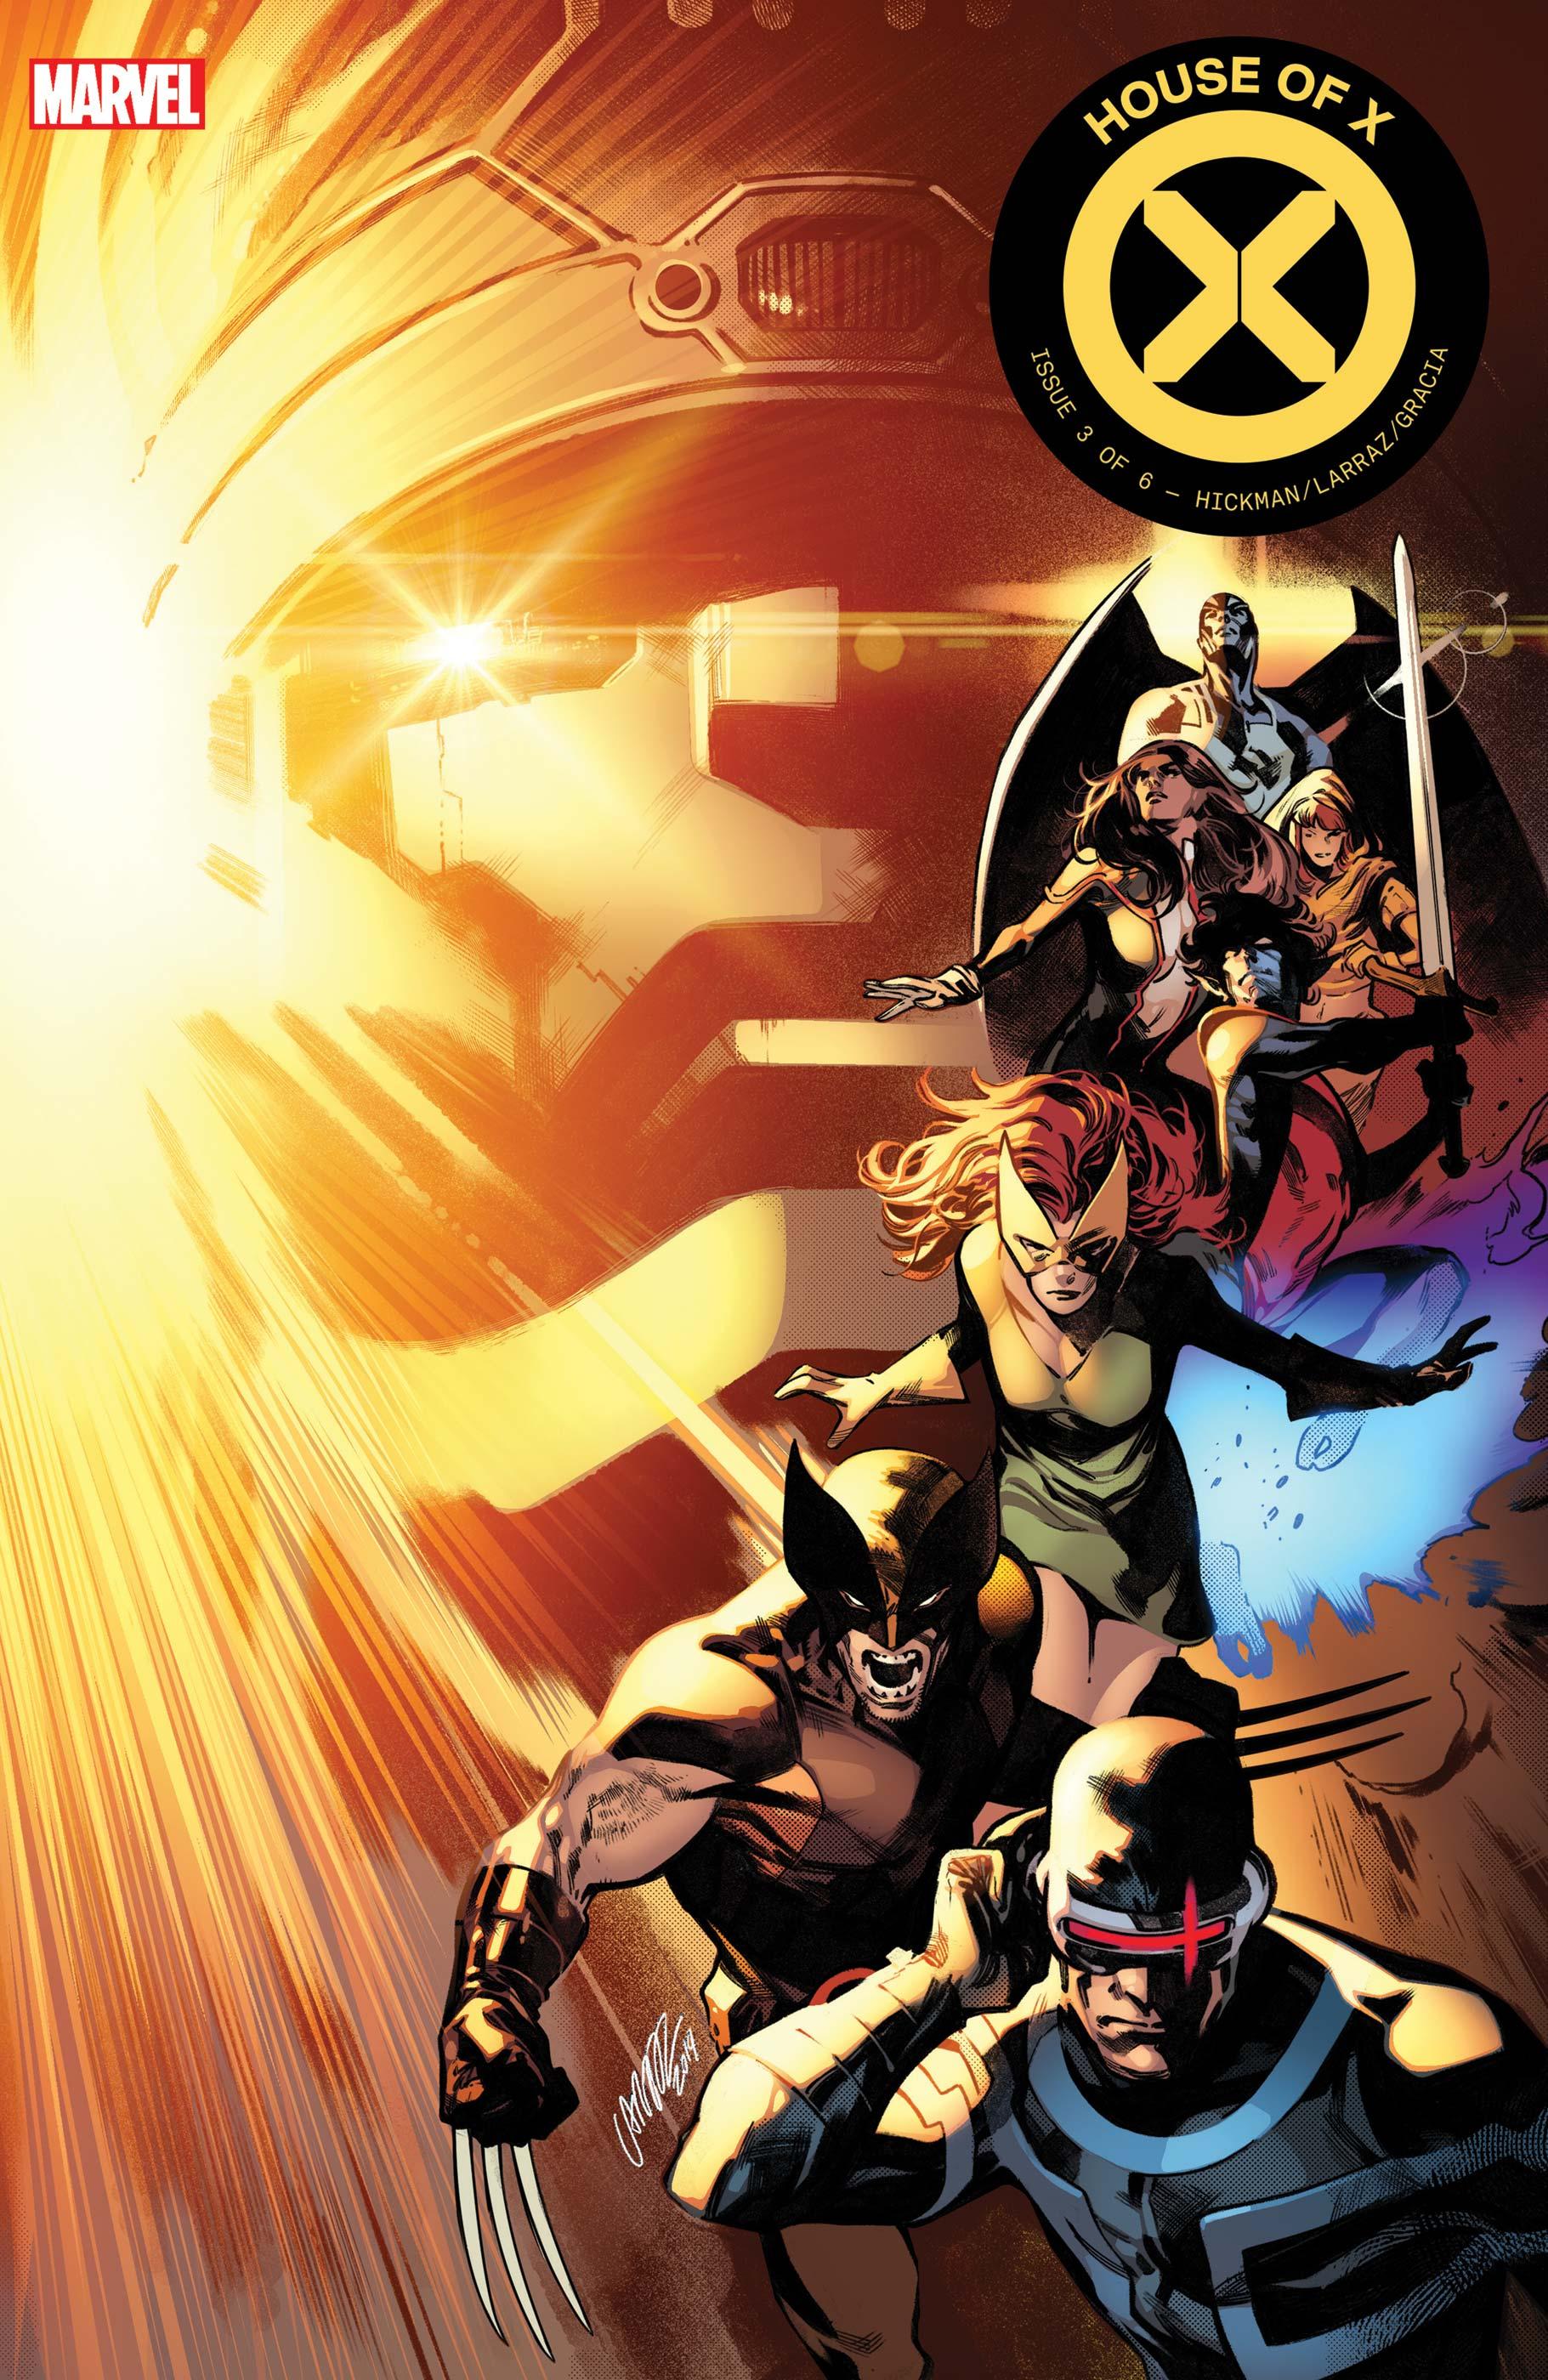 Portadas de cómics - Página 2 Clean